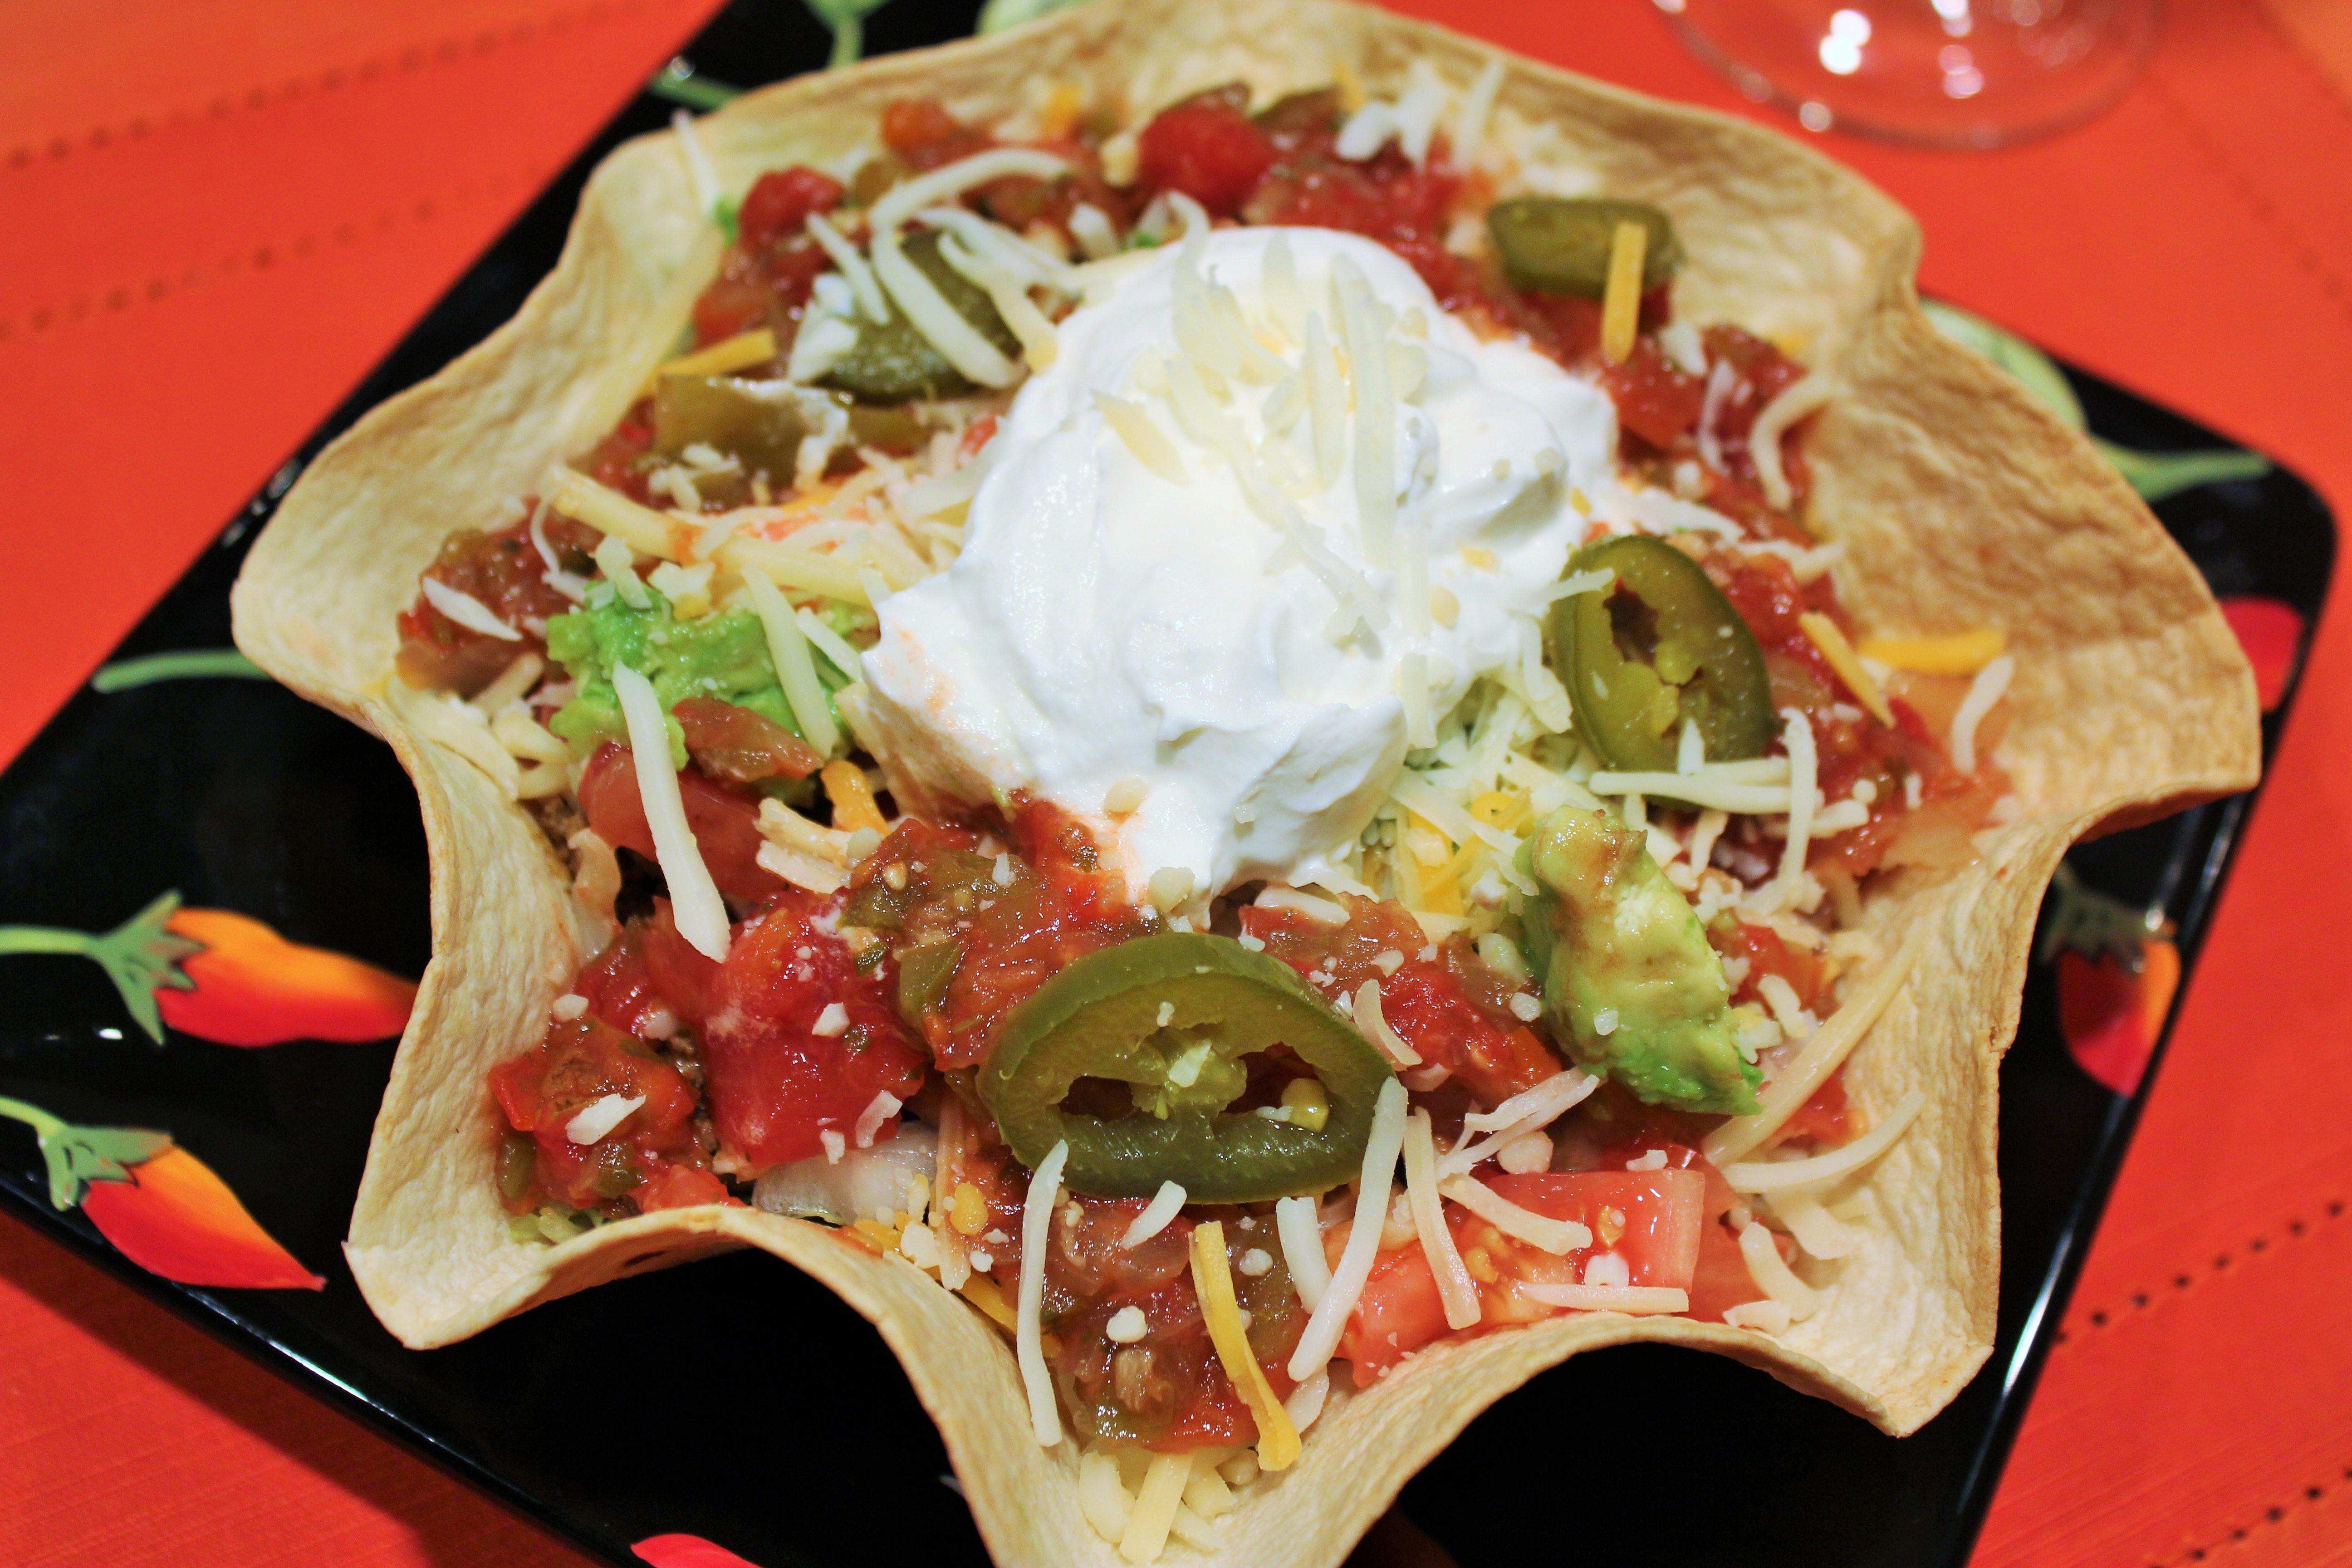 Kel S Tasty Taco Salad In Edible Tortilla Bowls Kel S